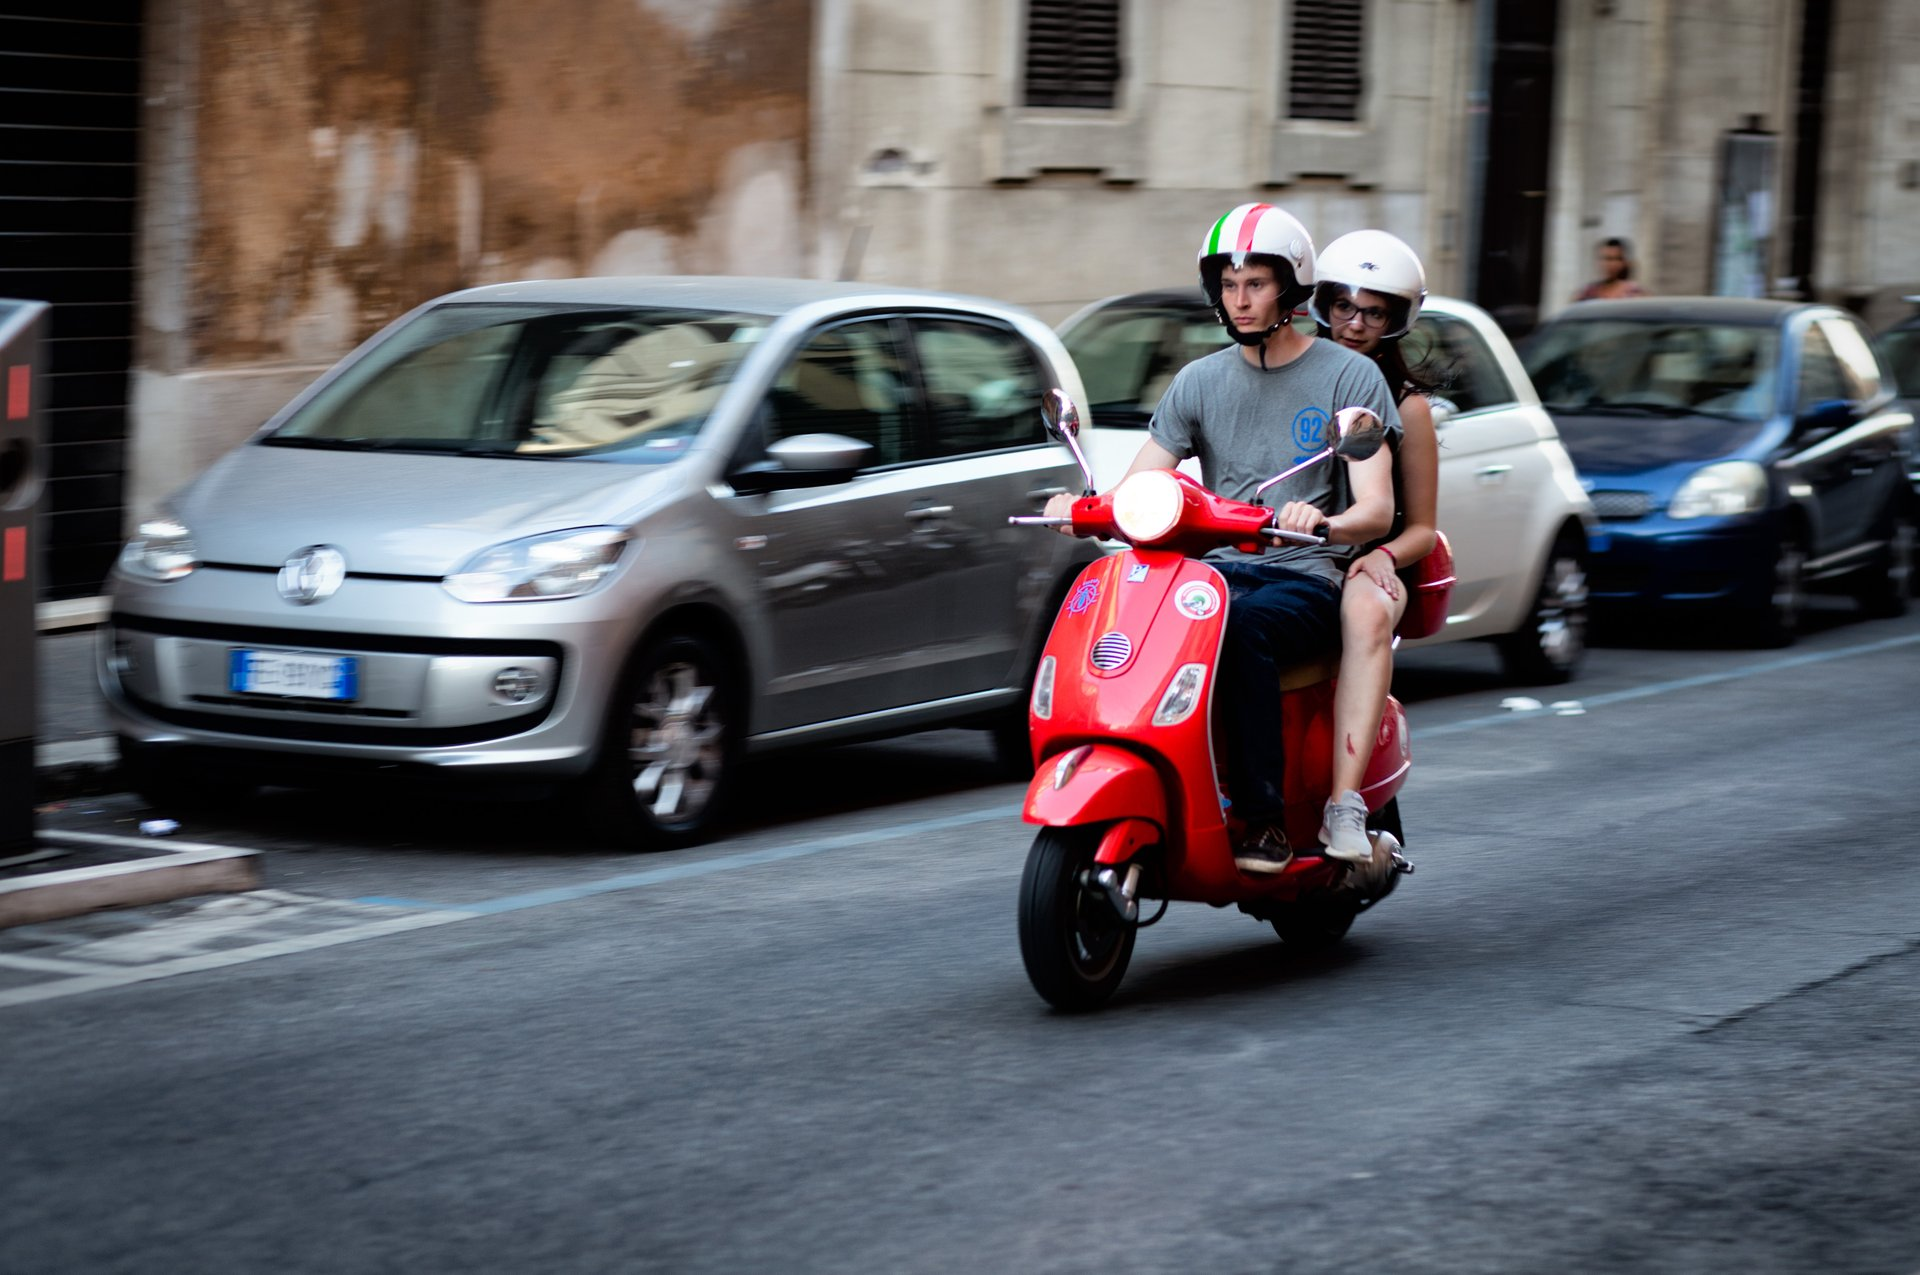 Vespa Scooter Tours in Rome - Best Season 2020